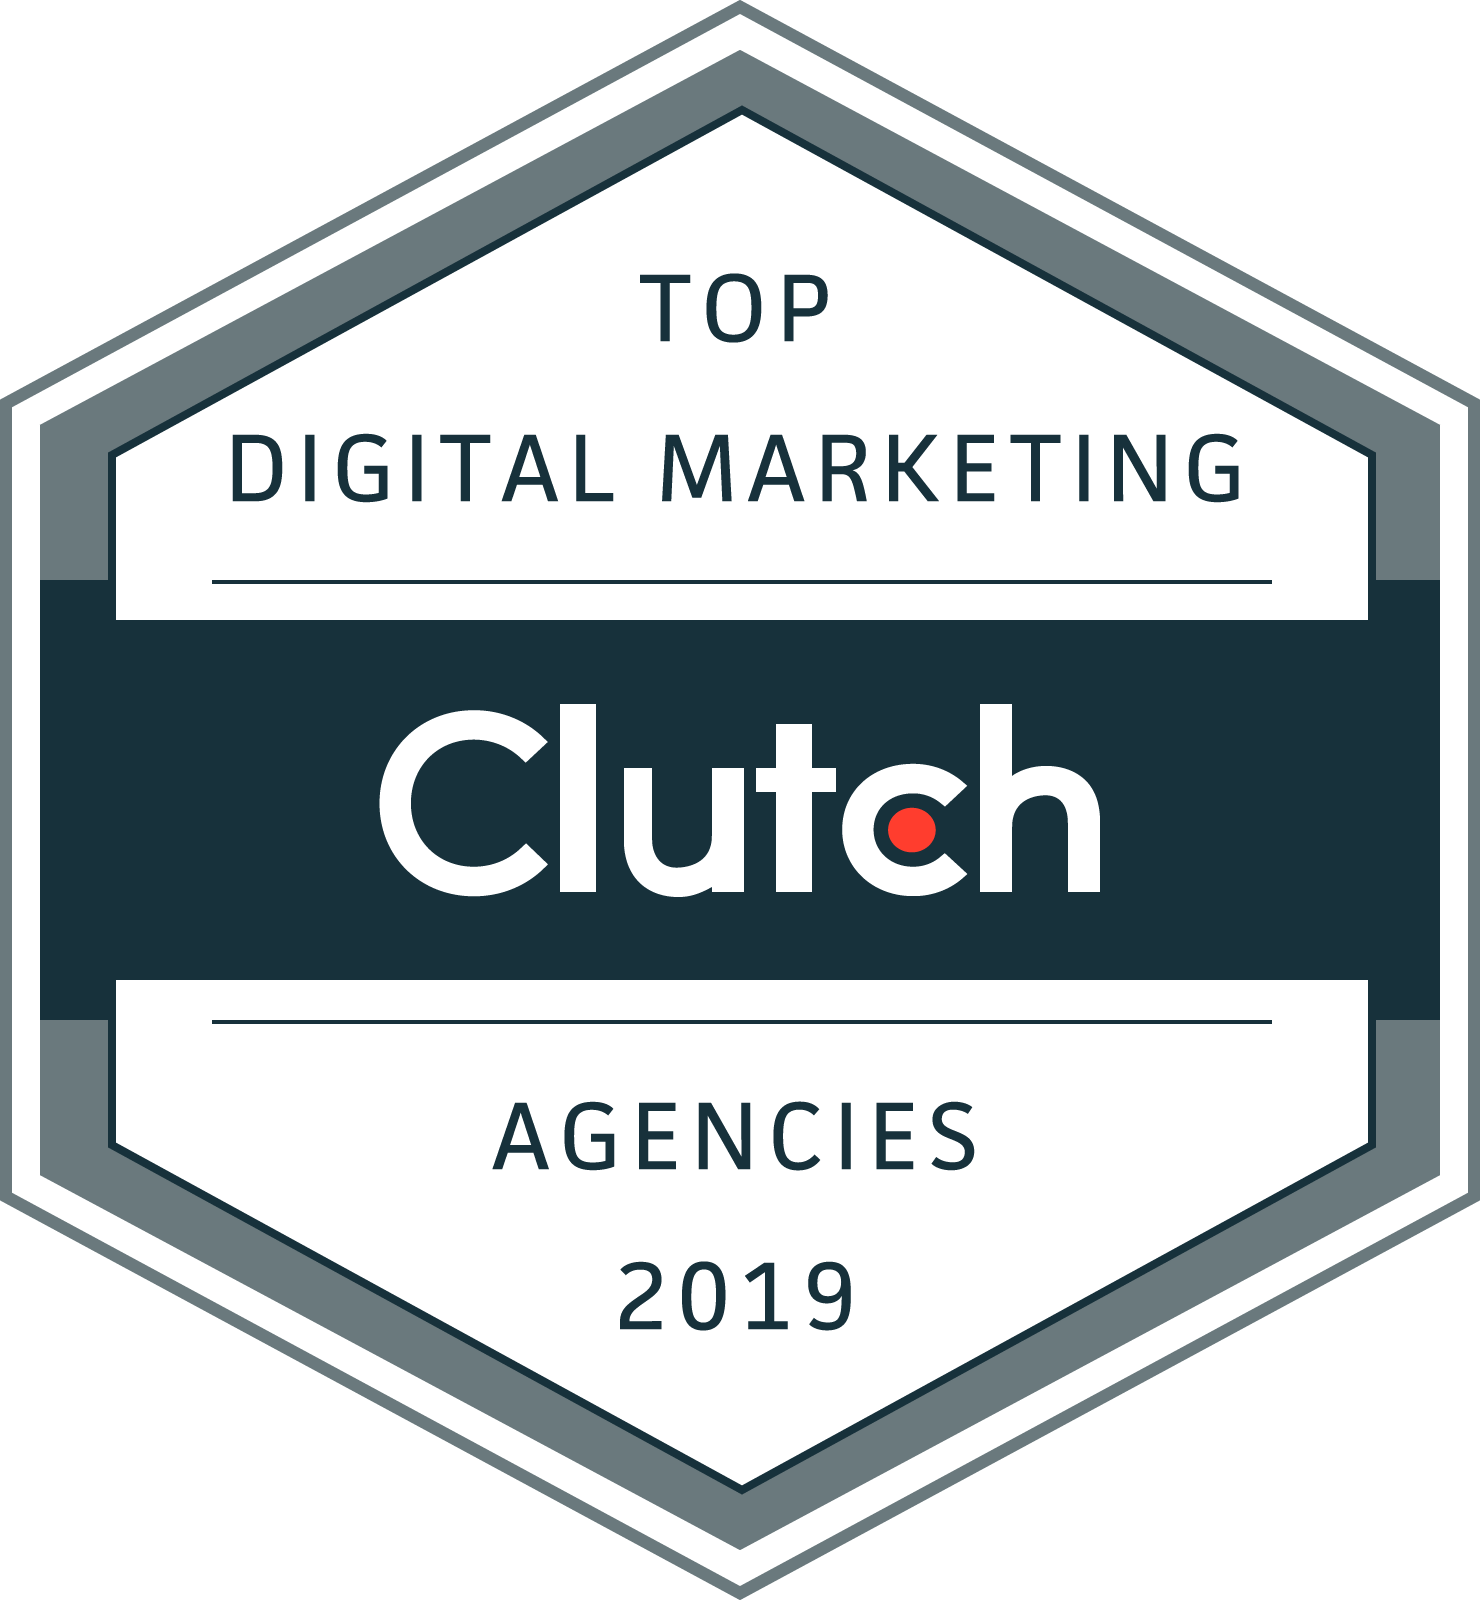 SUF Digital Top digital marketing agency